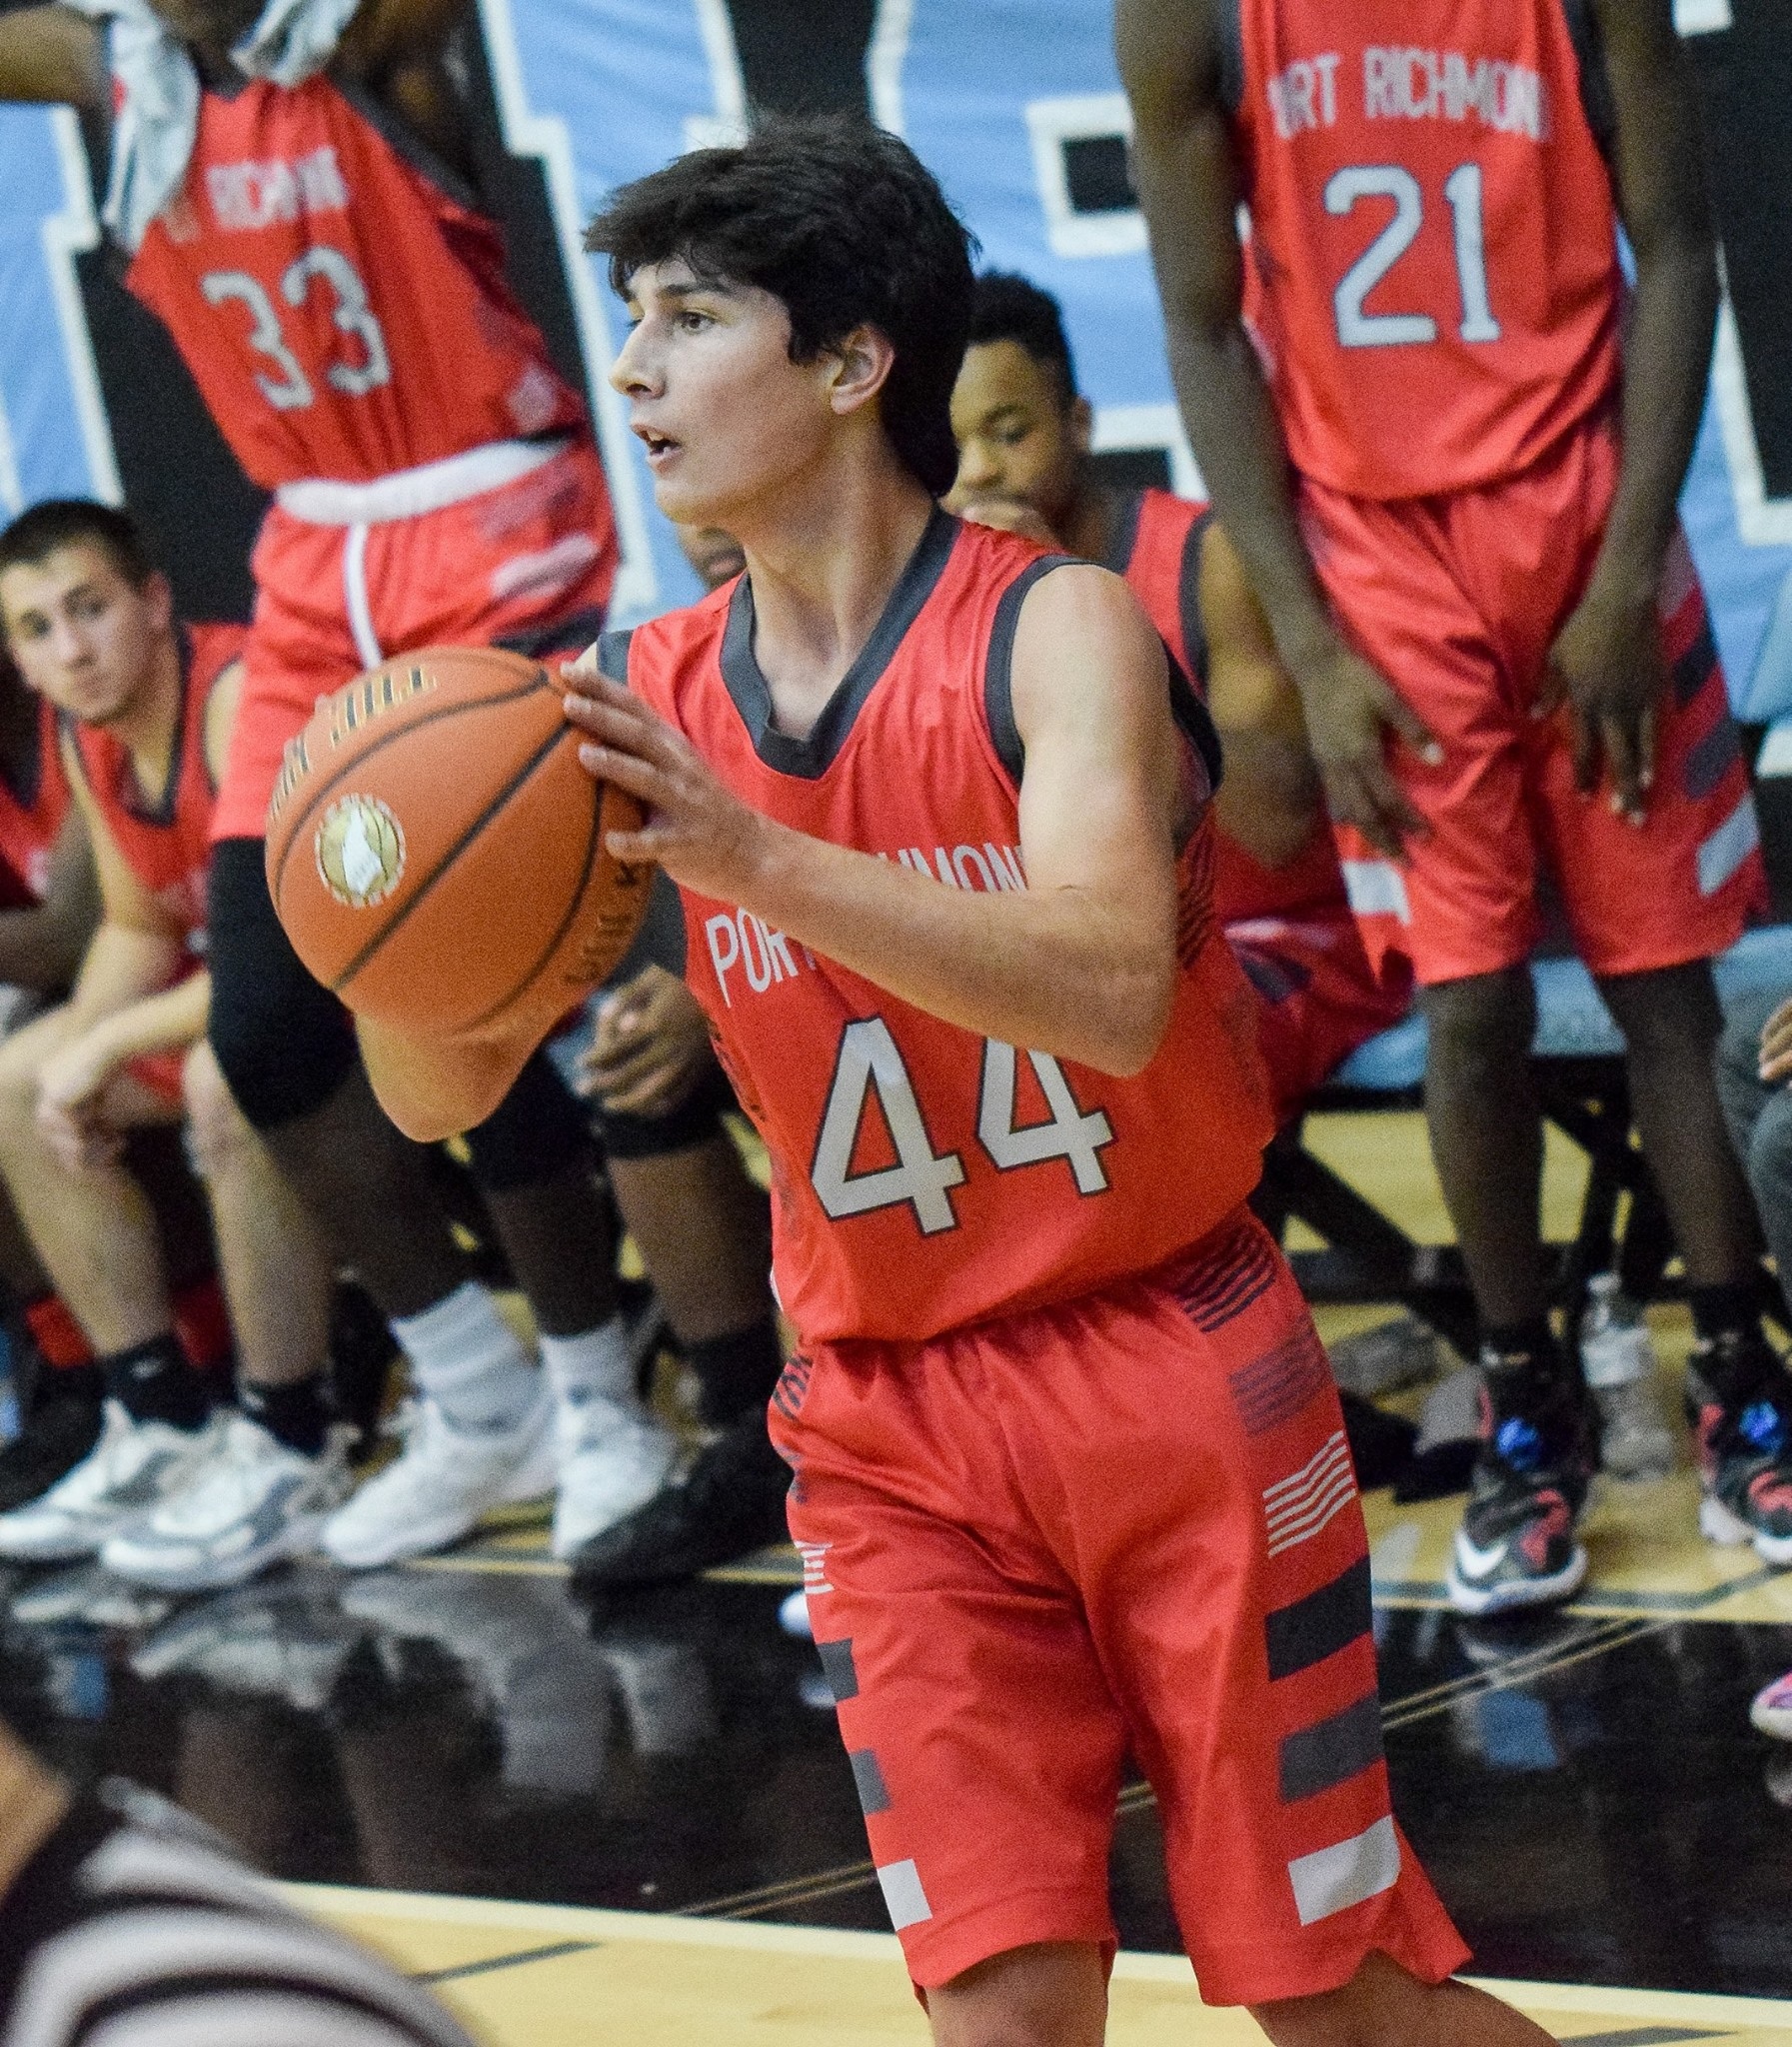 Orange White Gray Black School basketball uniforms jerseys tops, shorts